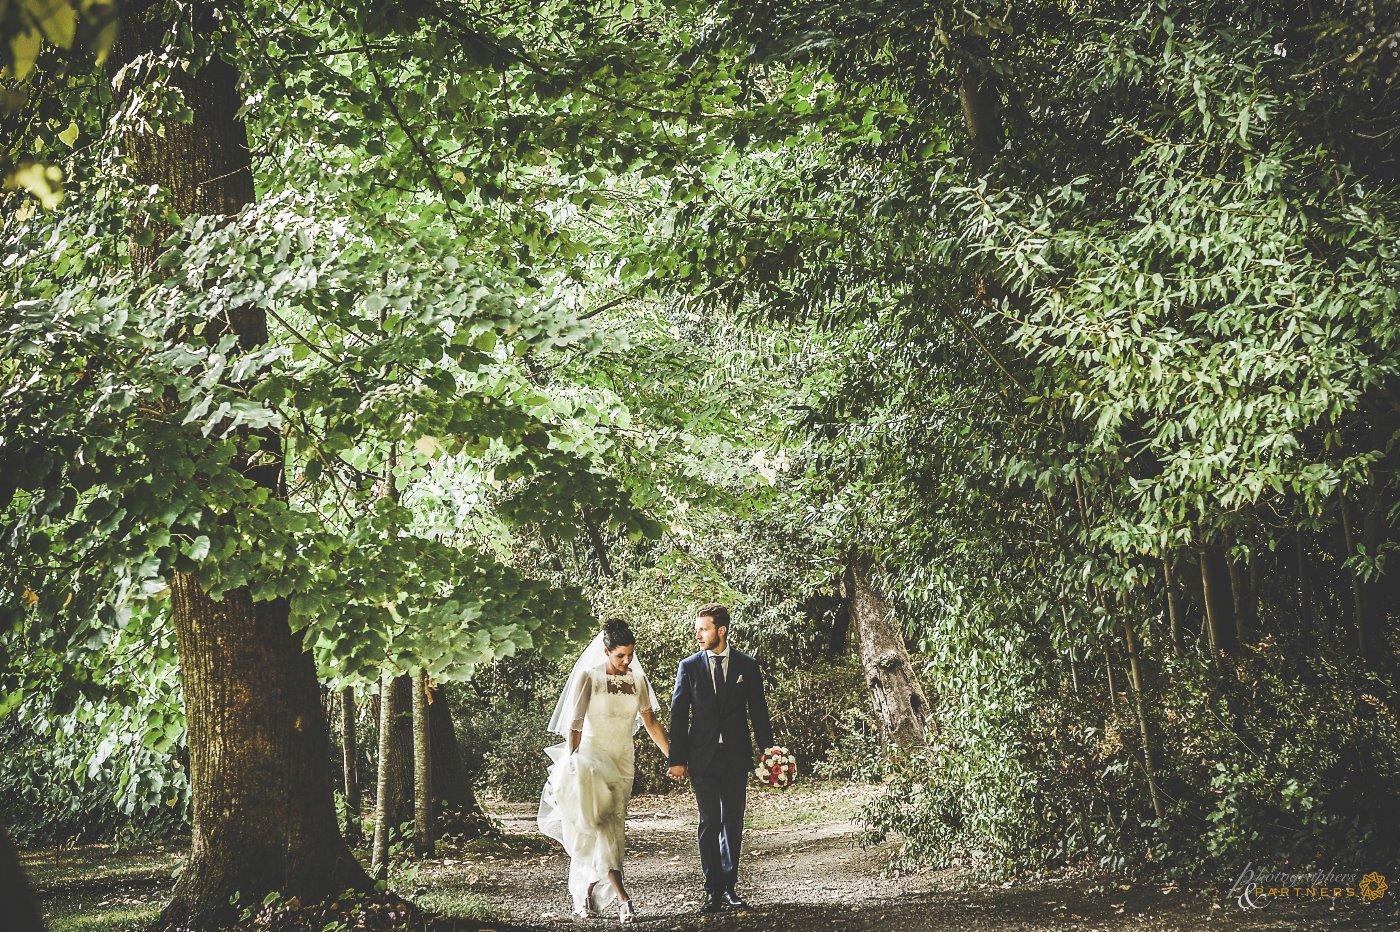 photography_weddings_villa_grabau_10.jpg